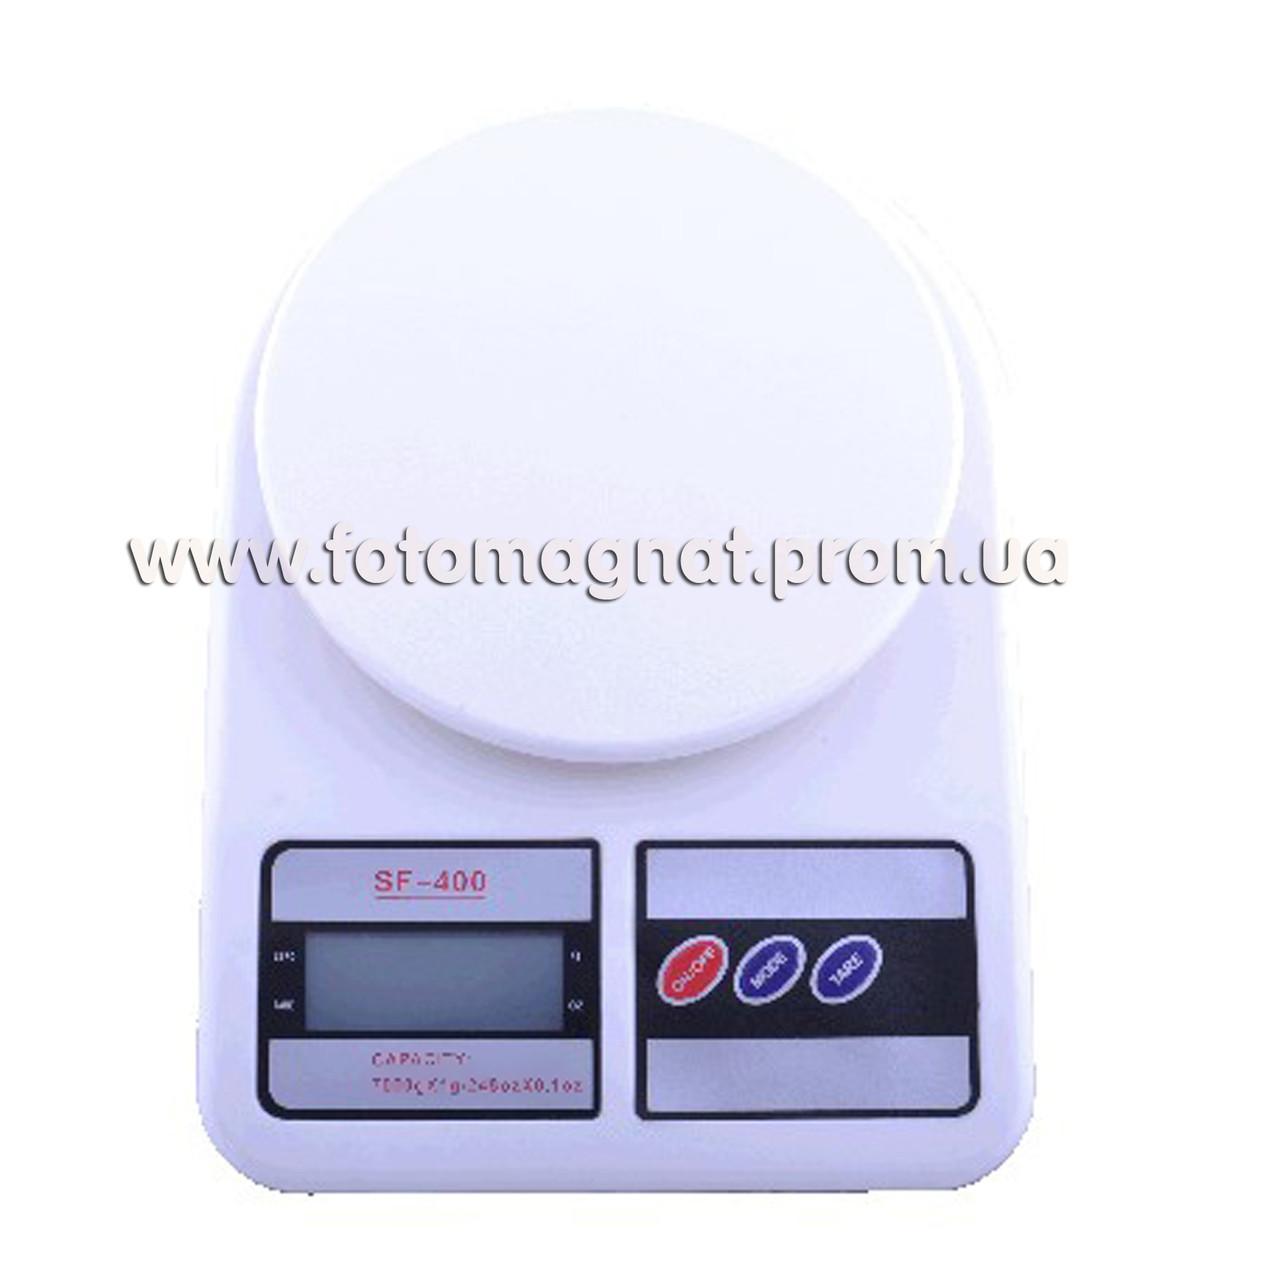 Весы кухонные электронные NN SF 400 (7кг) /101/6101 (электронные весы)